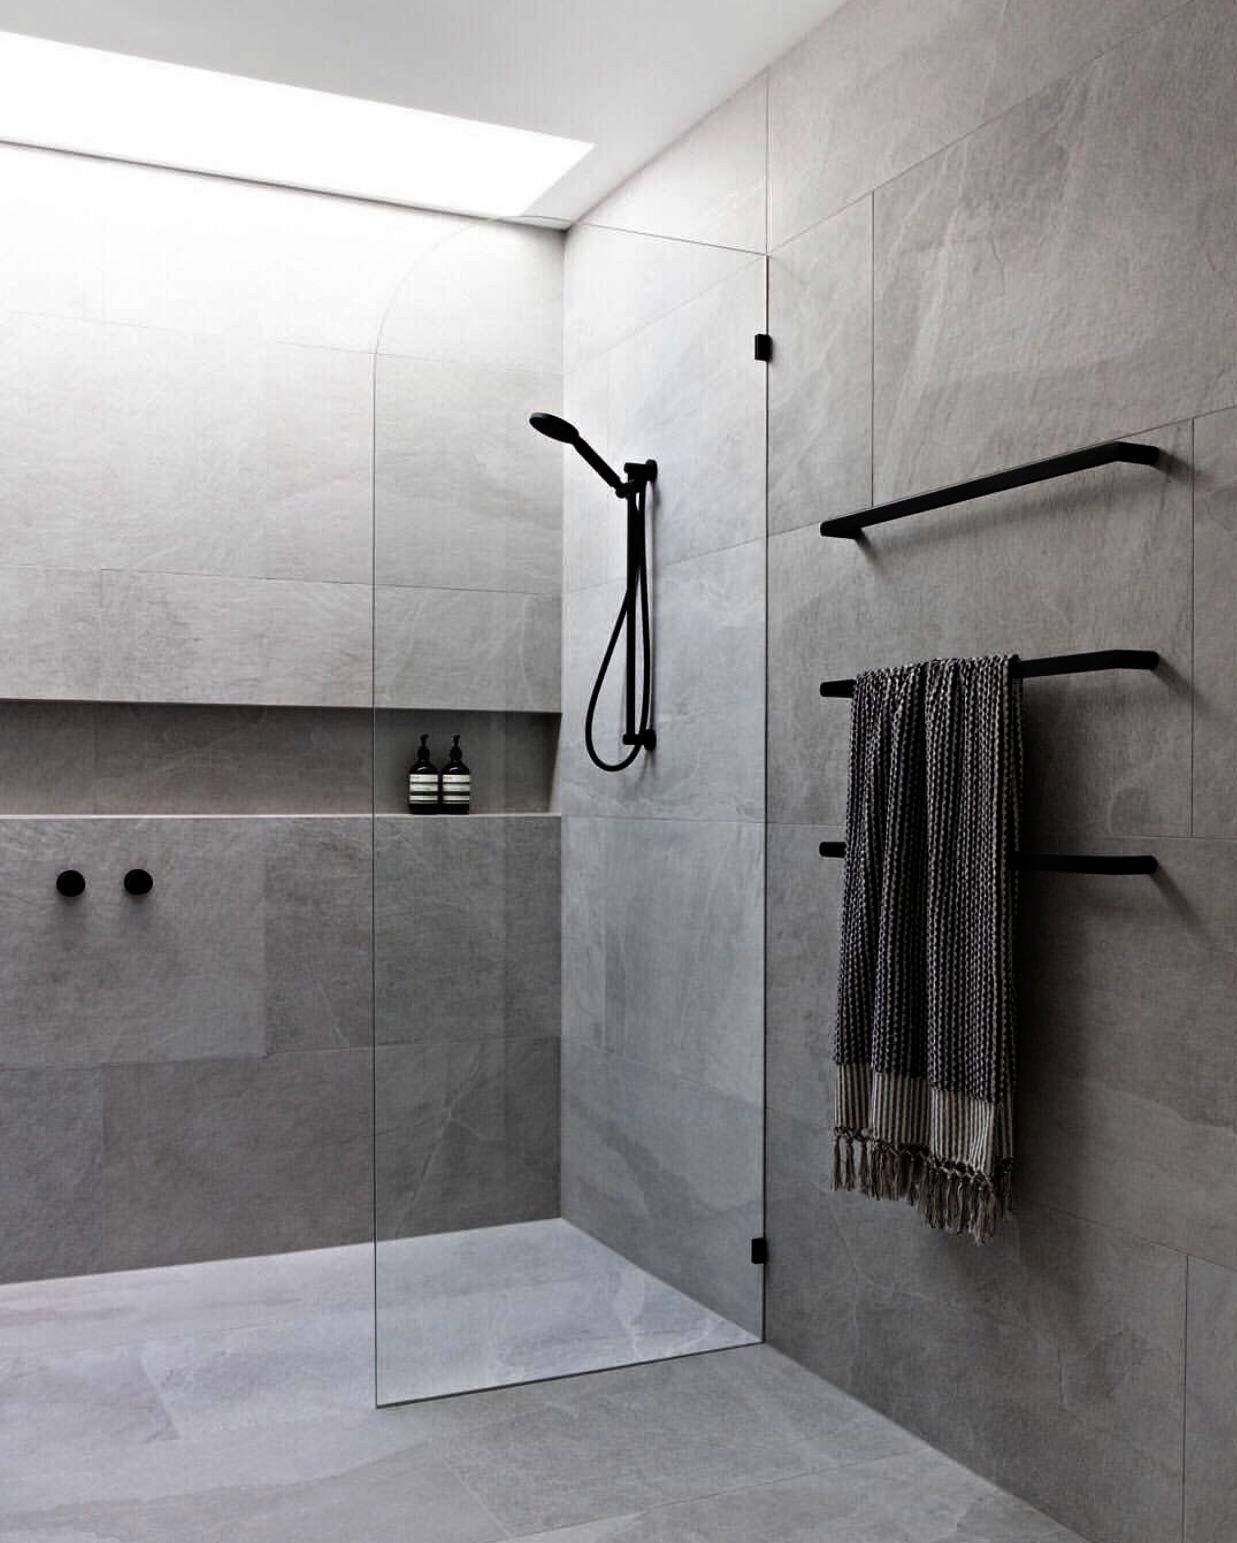 Bathroom Remodel Grey Bathroom Tiles Pics Except Bathroom Storage Rack Online Modern Bathroom Modern Bathroom Design Bathroom Interior